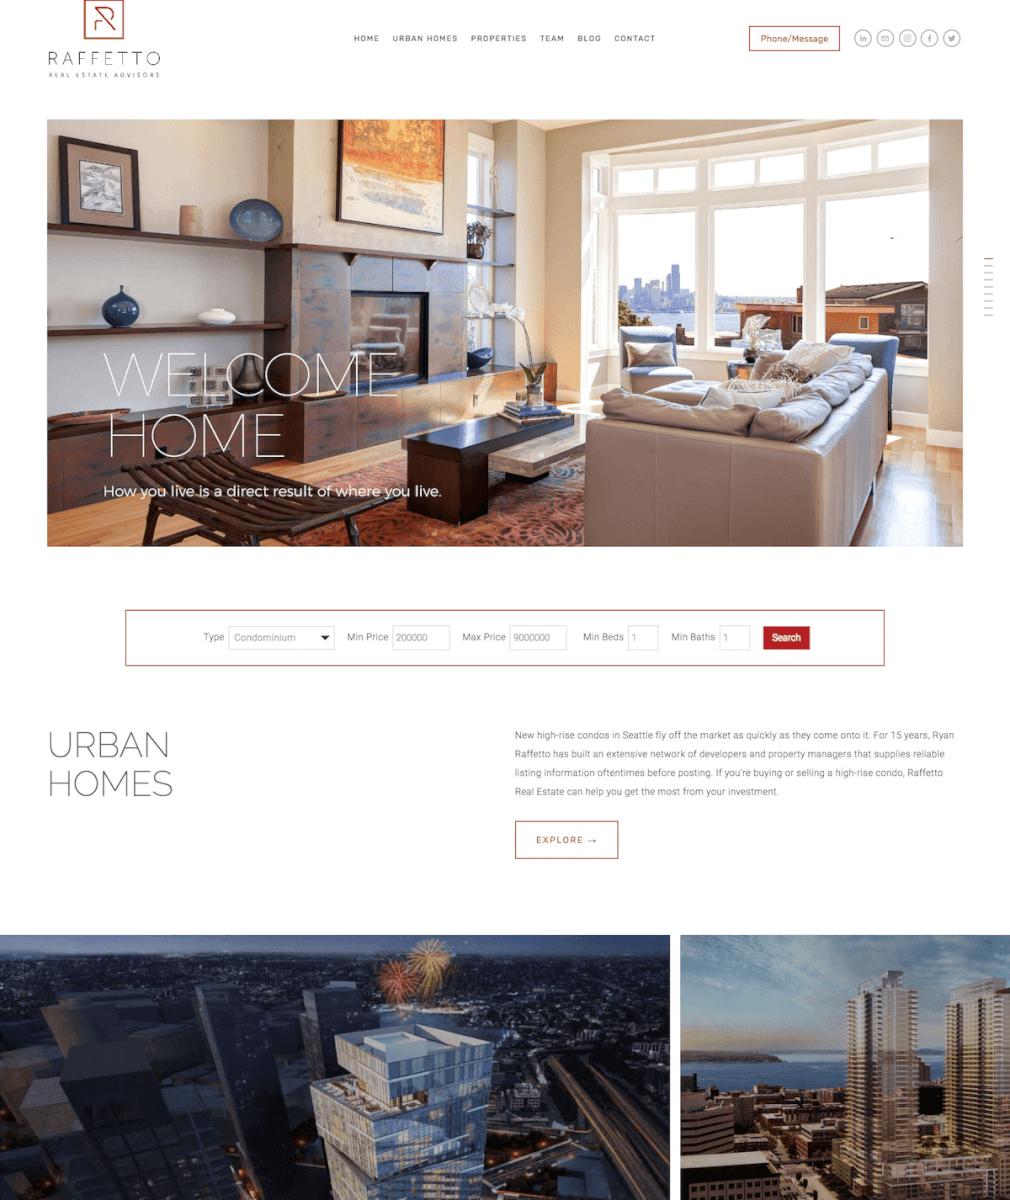 SquareSpace real estate website for Raffetto